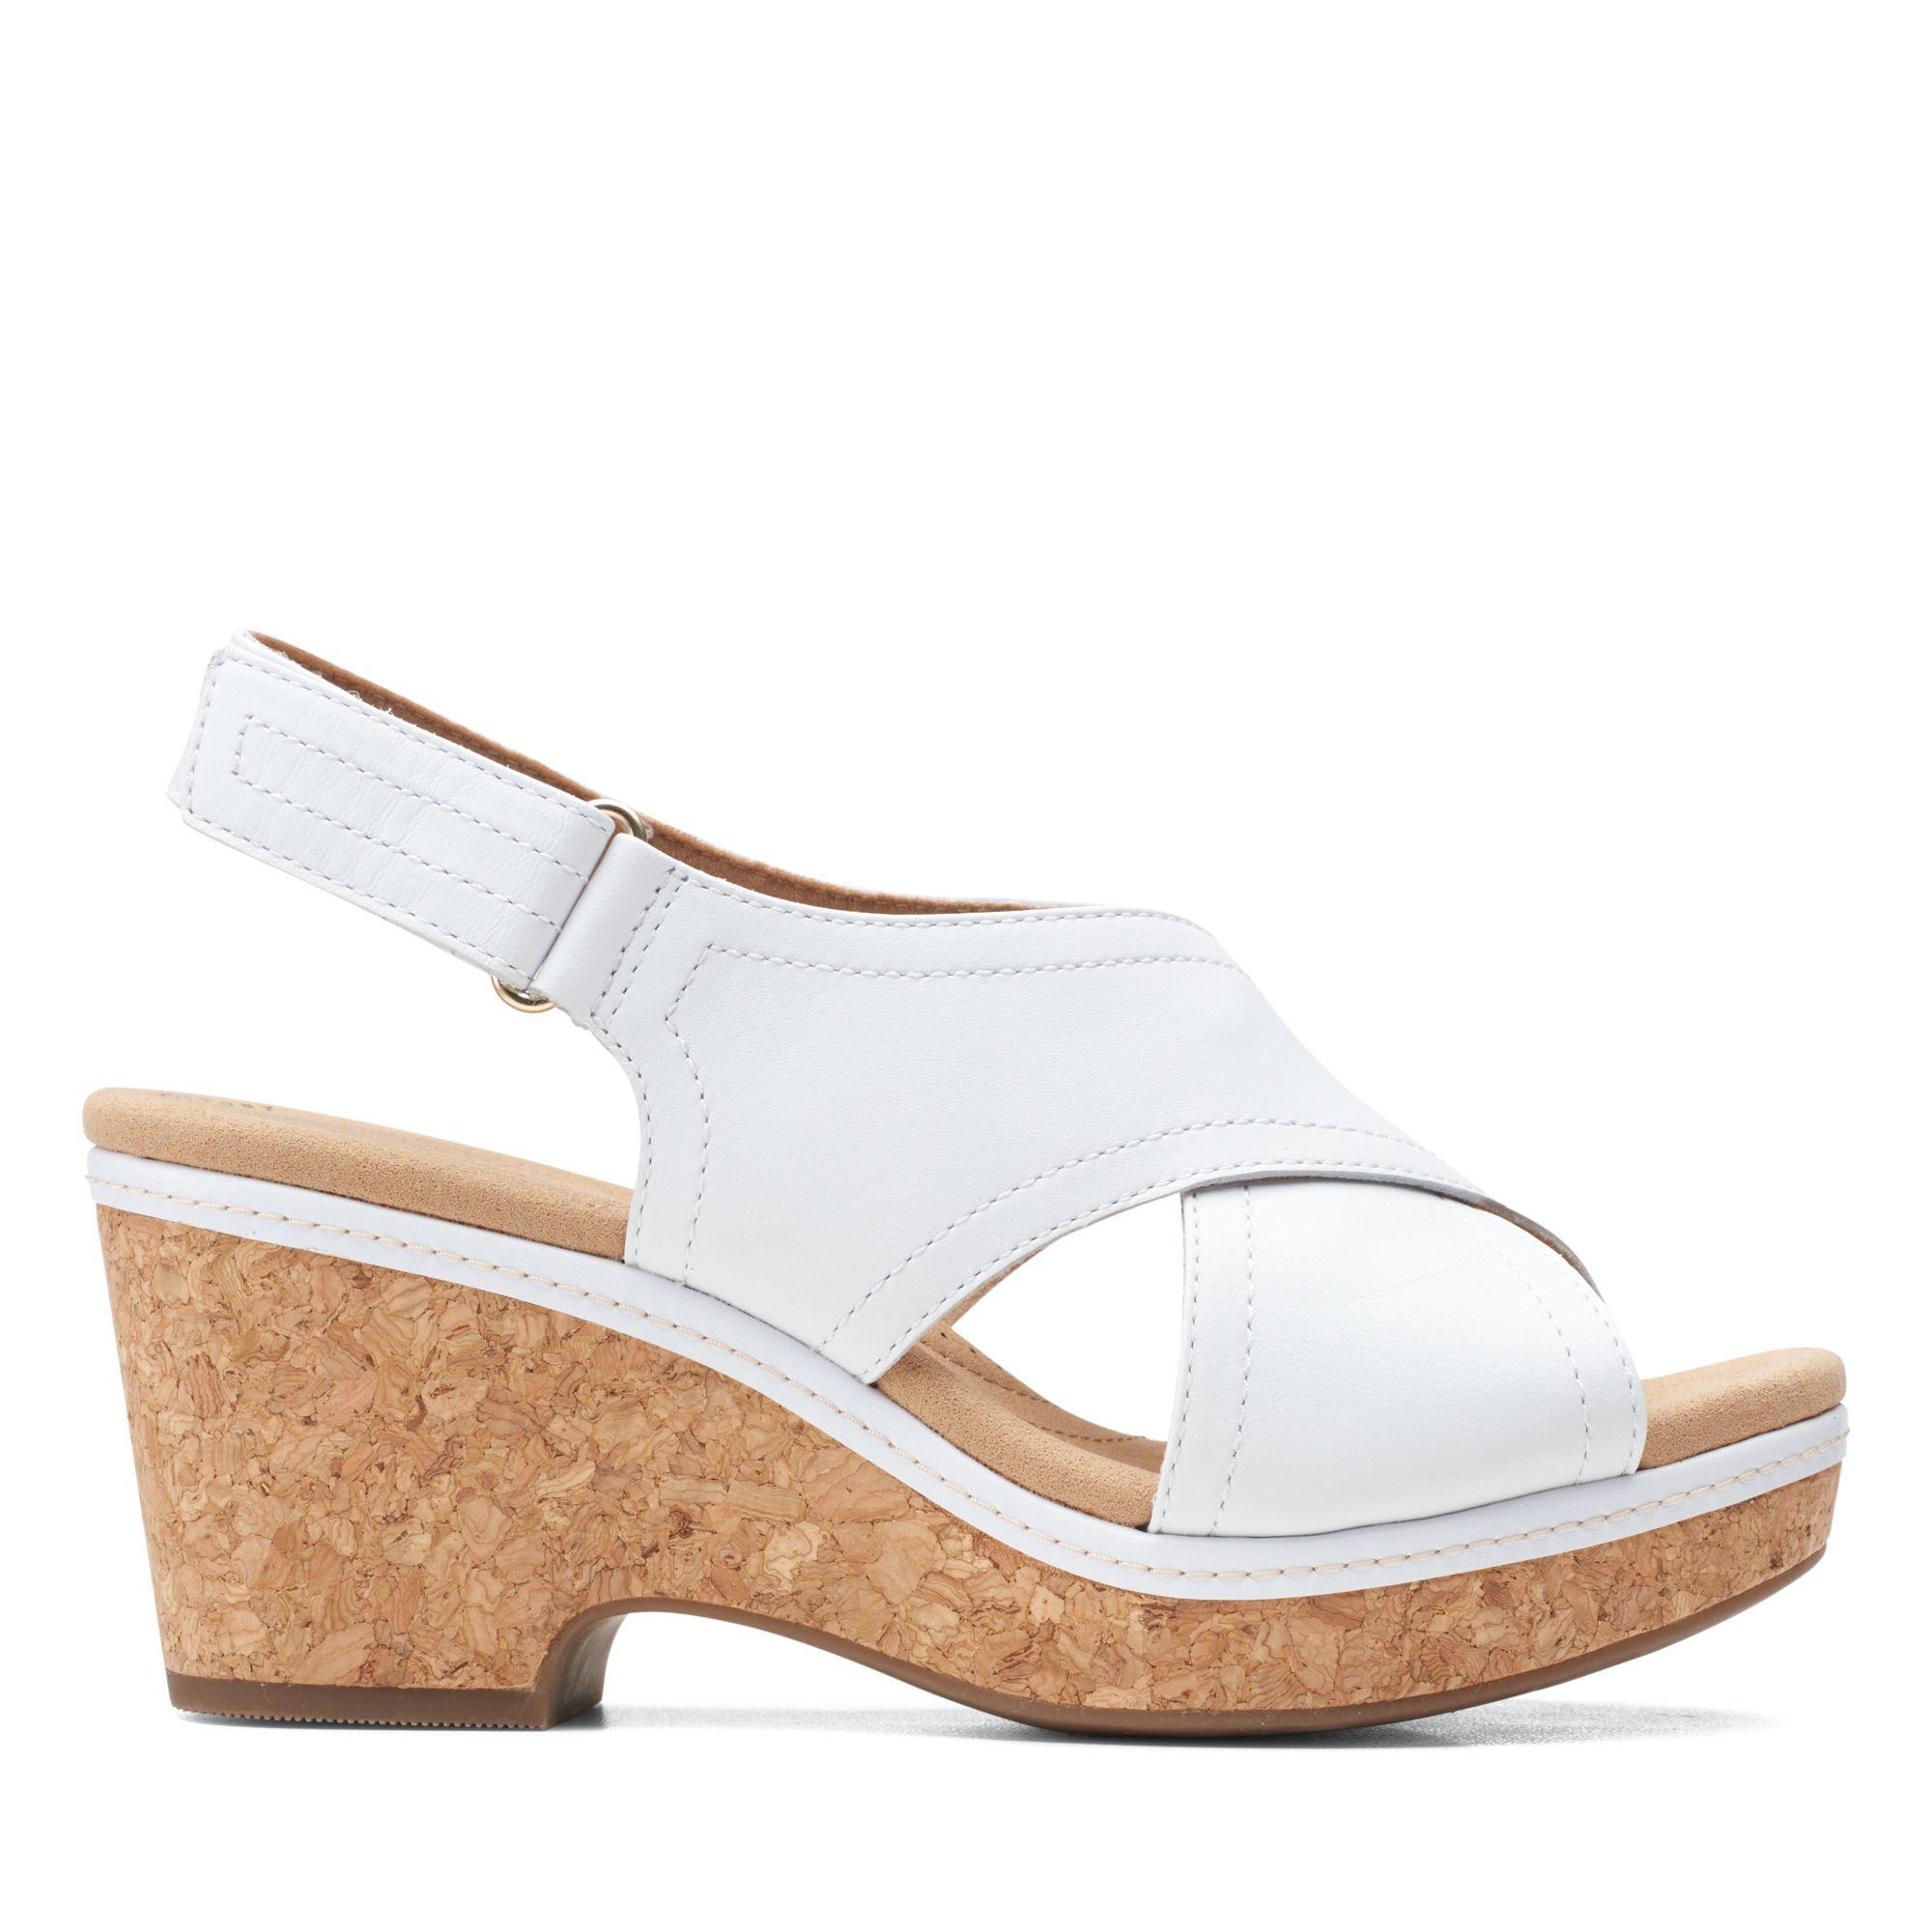 Clarks仲夏之夢-Giselle Cove前交織勺型厚底涼鞋(白色)